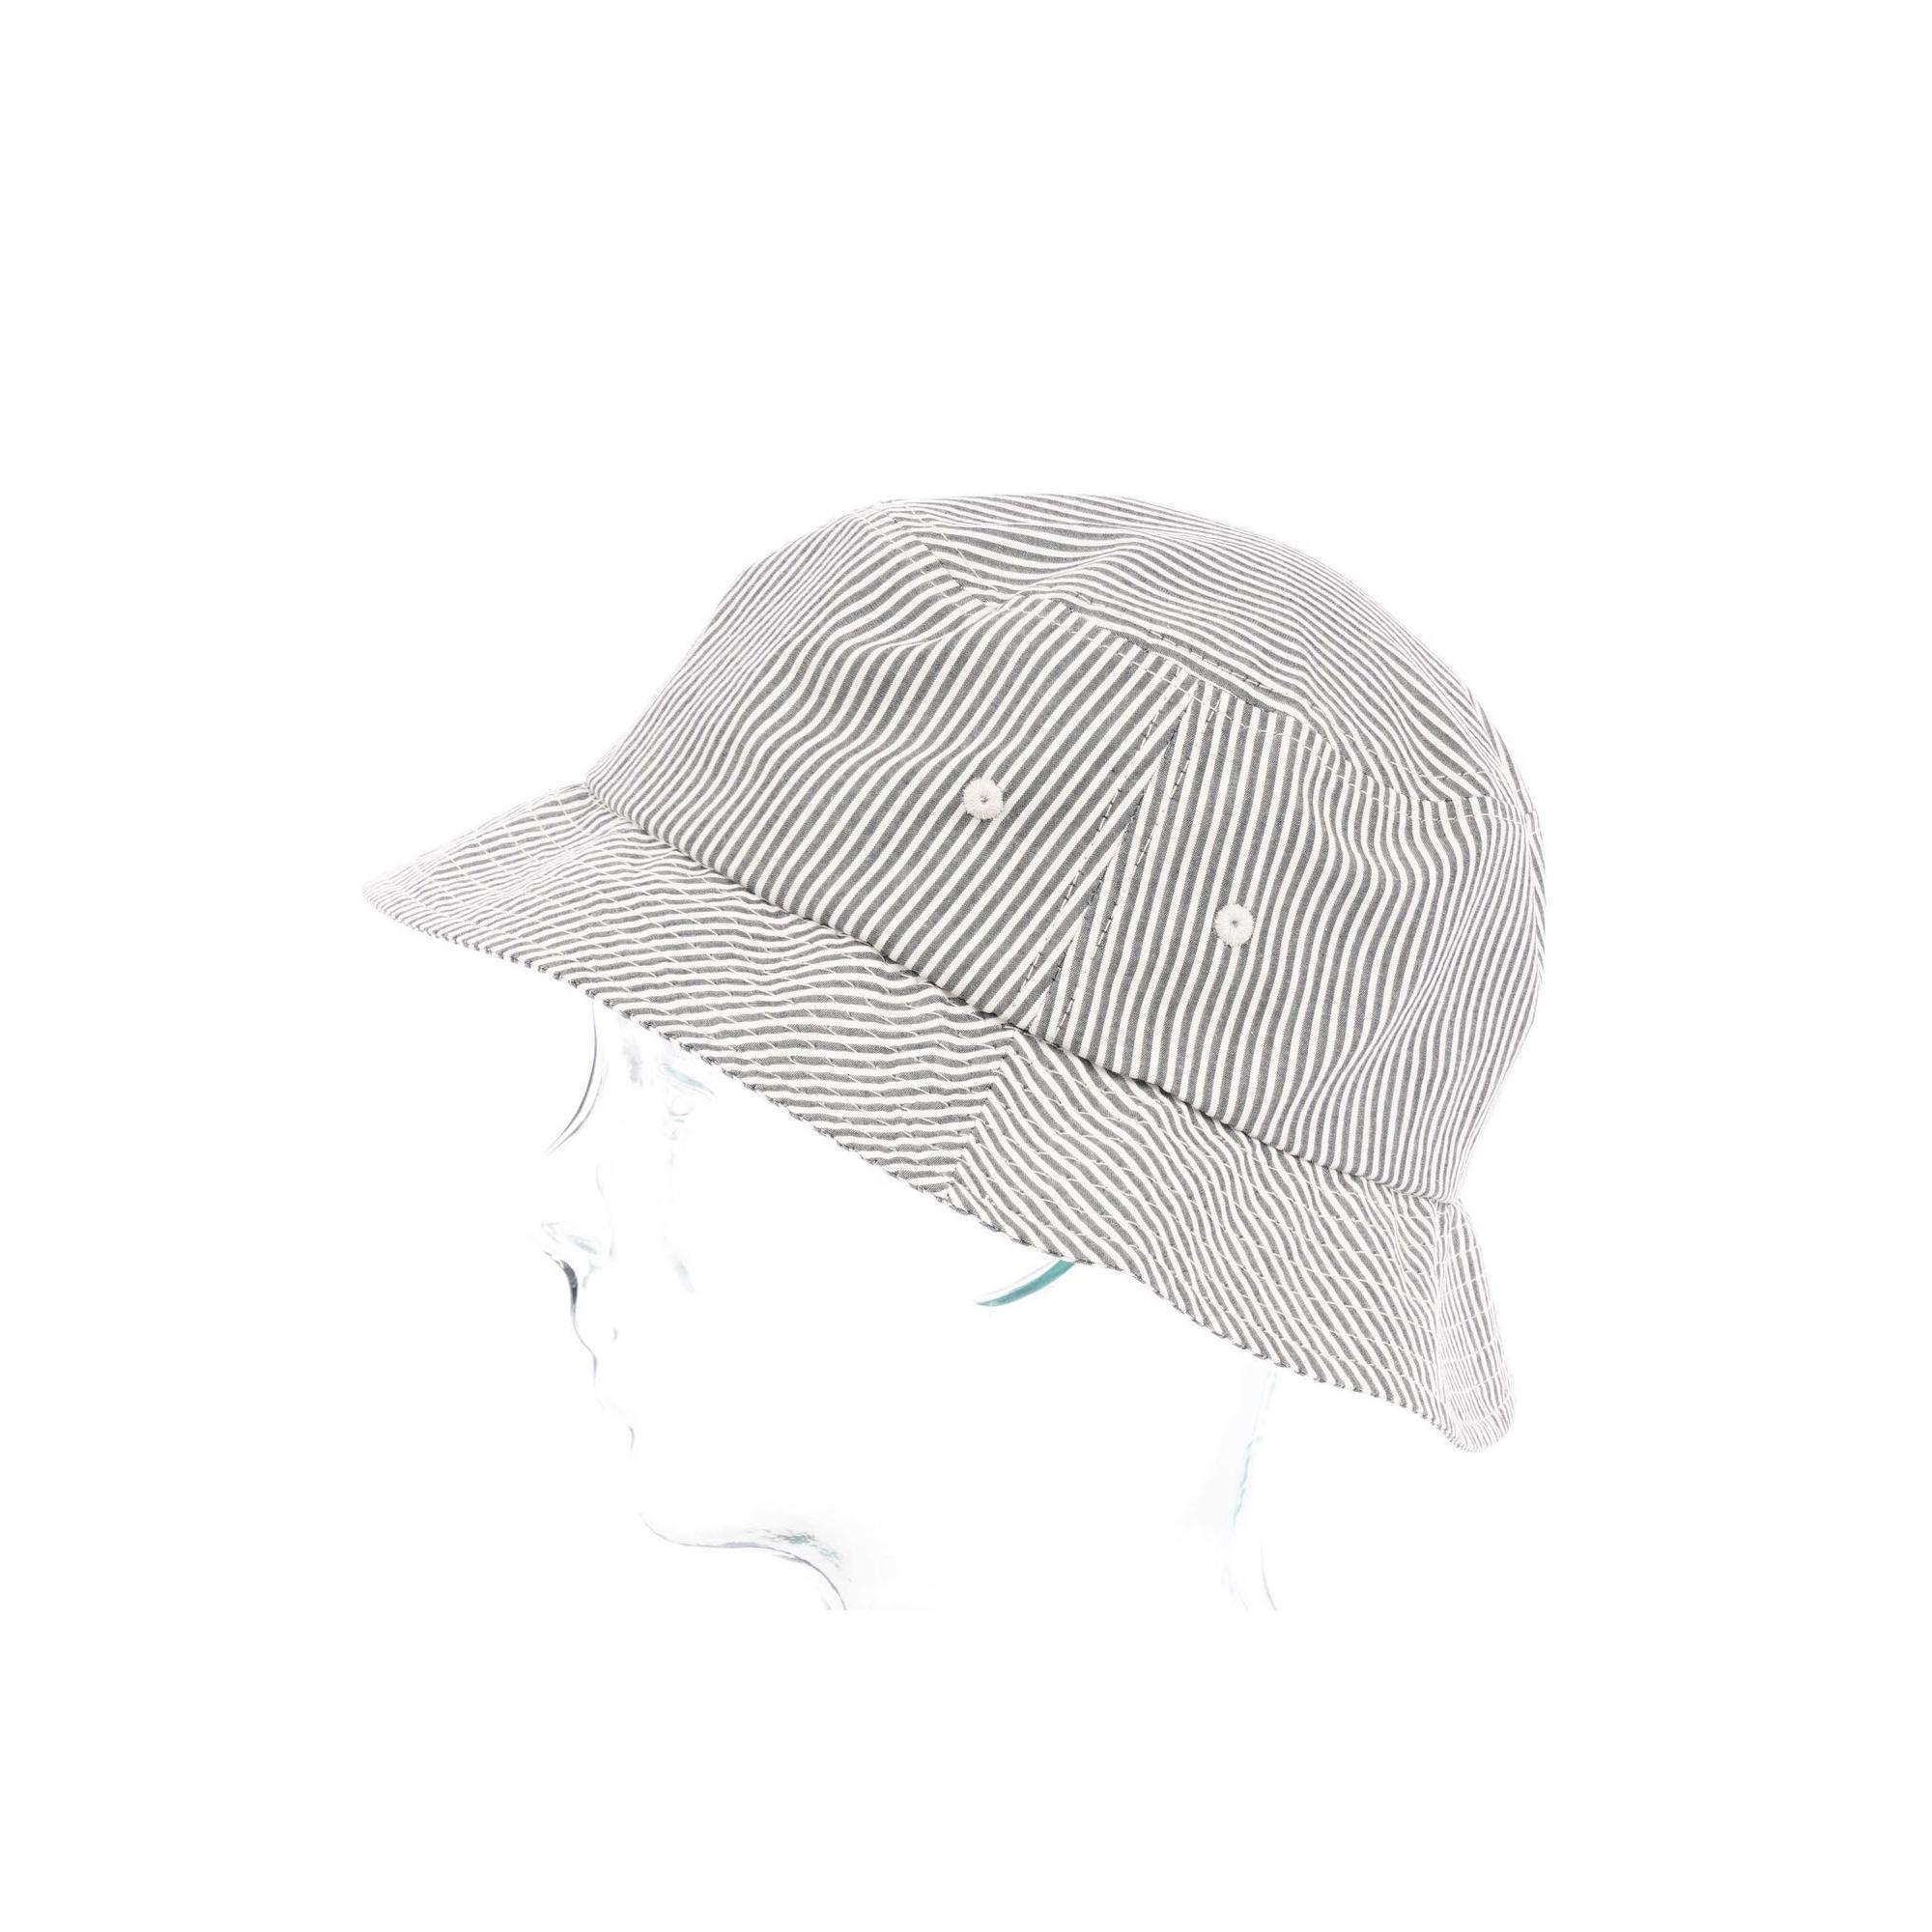 358c0a22036a0 ... Seersucker Bucket Hat - Lyst. View fullscreen